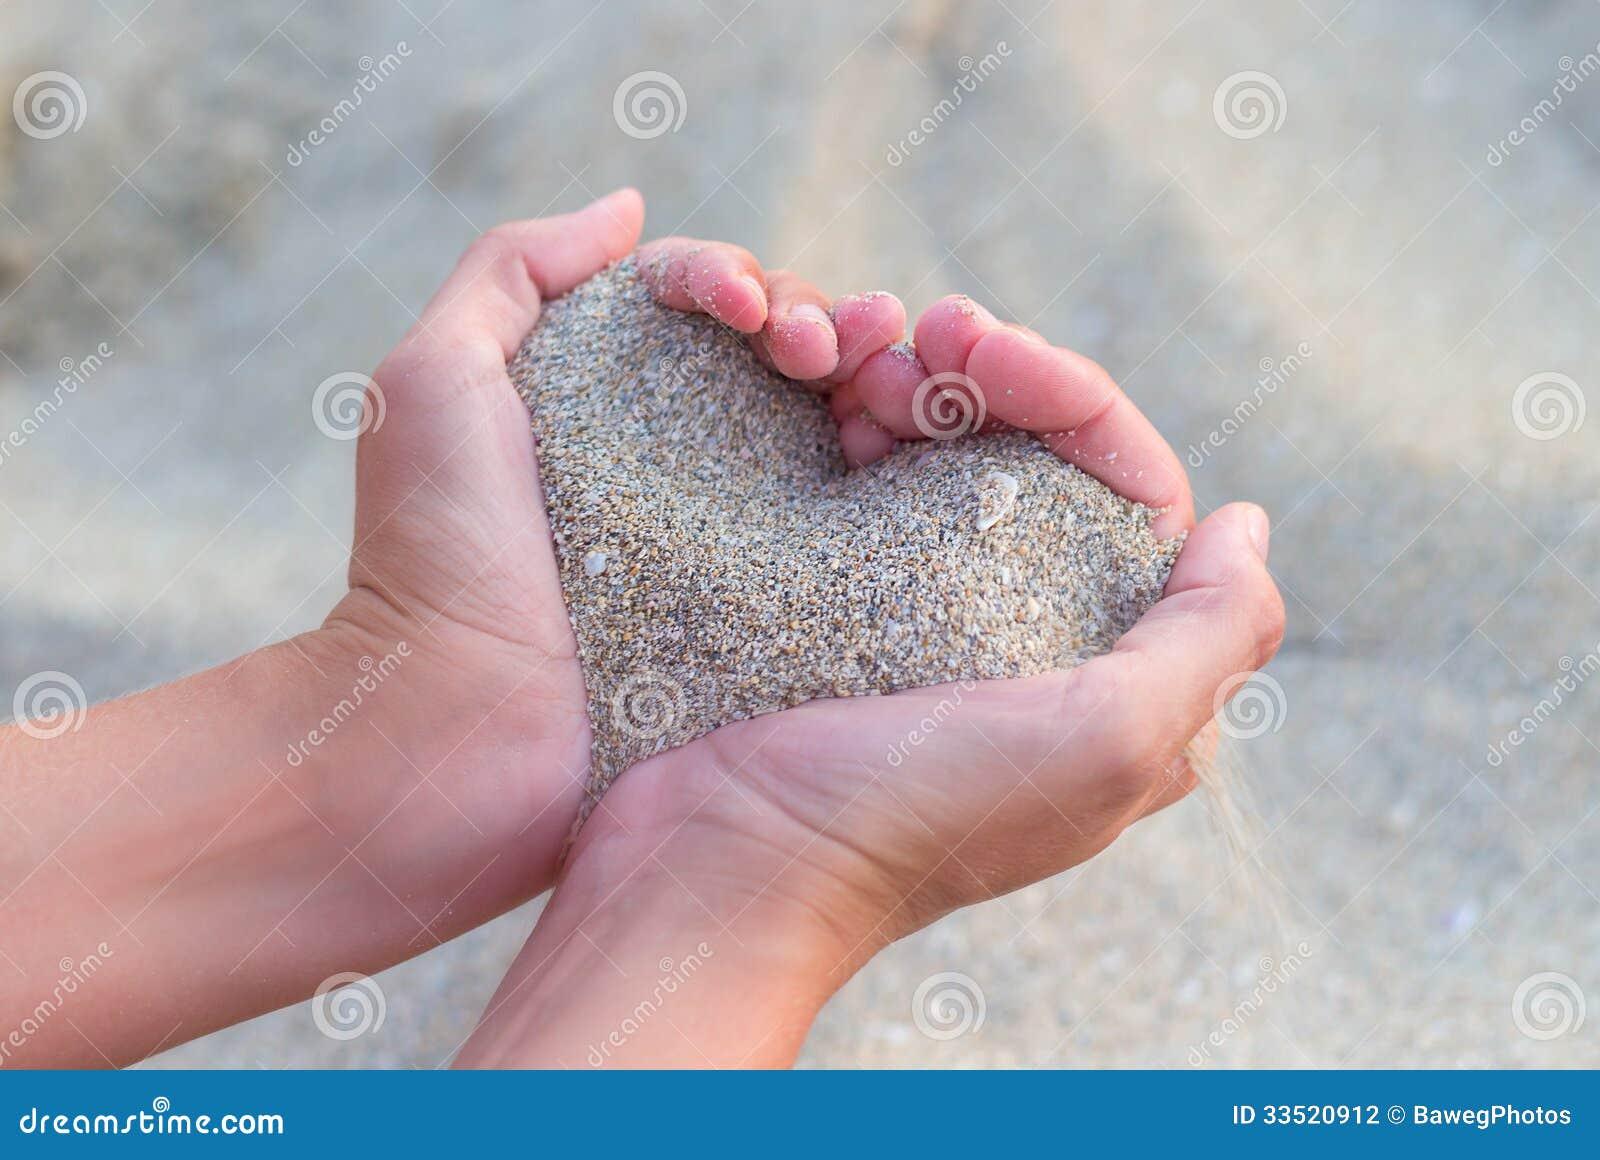 Serce robić piasek